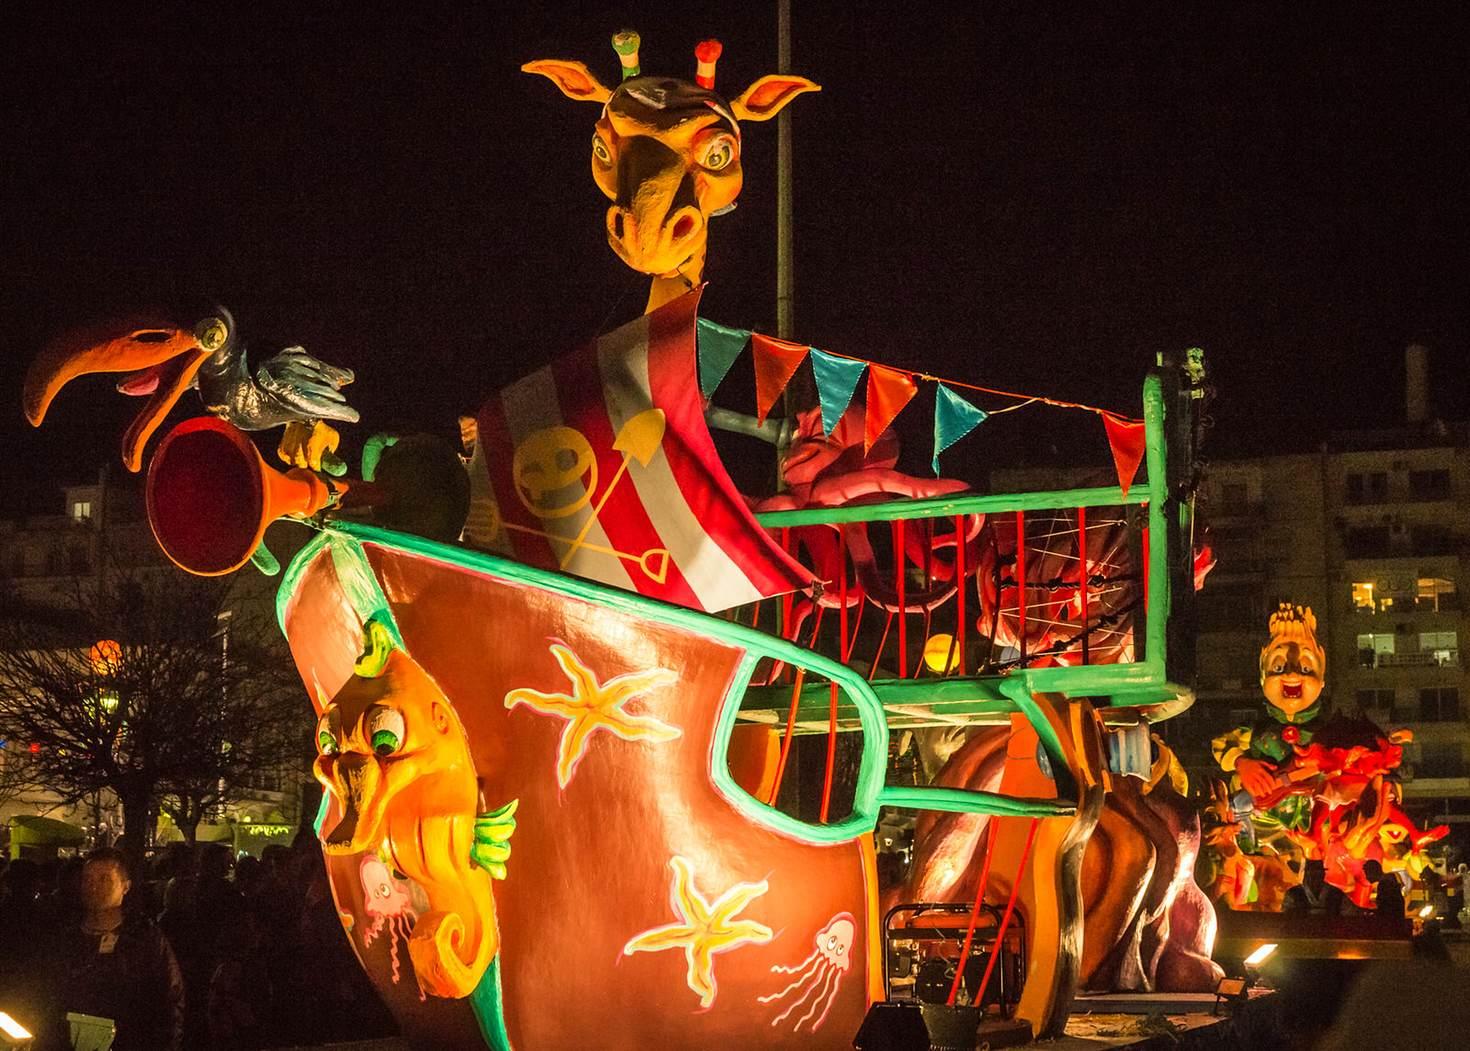 Party at the Patras Carnival